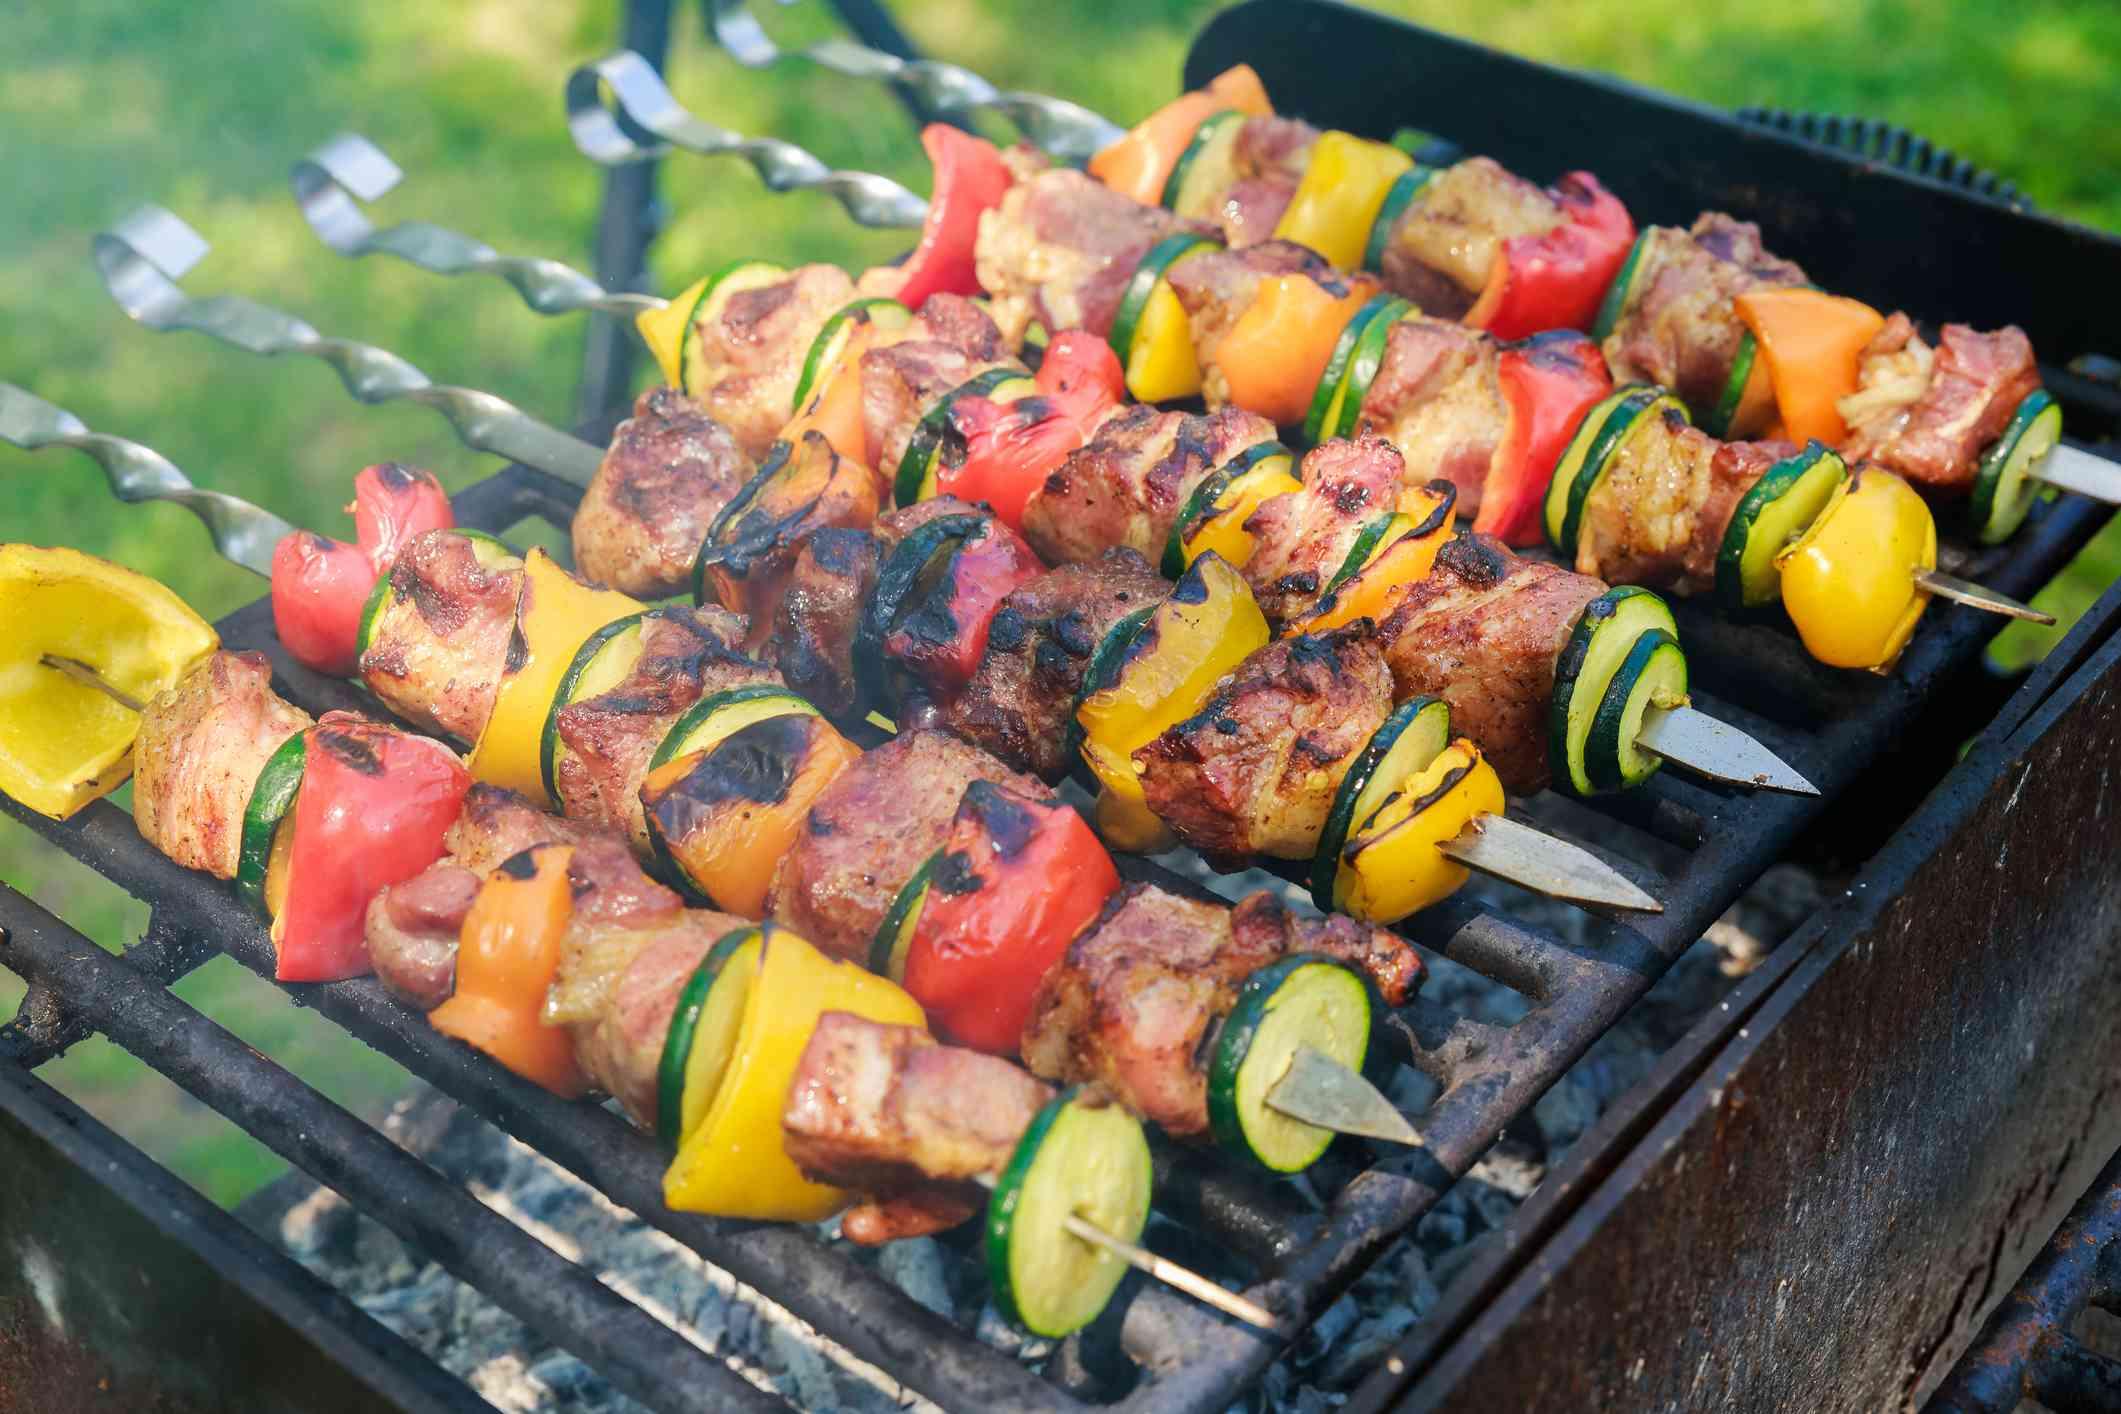 Meat and vegetable kebab skewers on a barbecue.